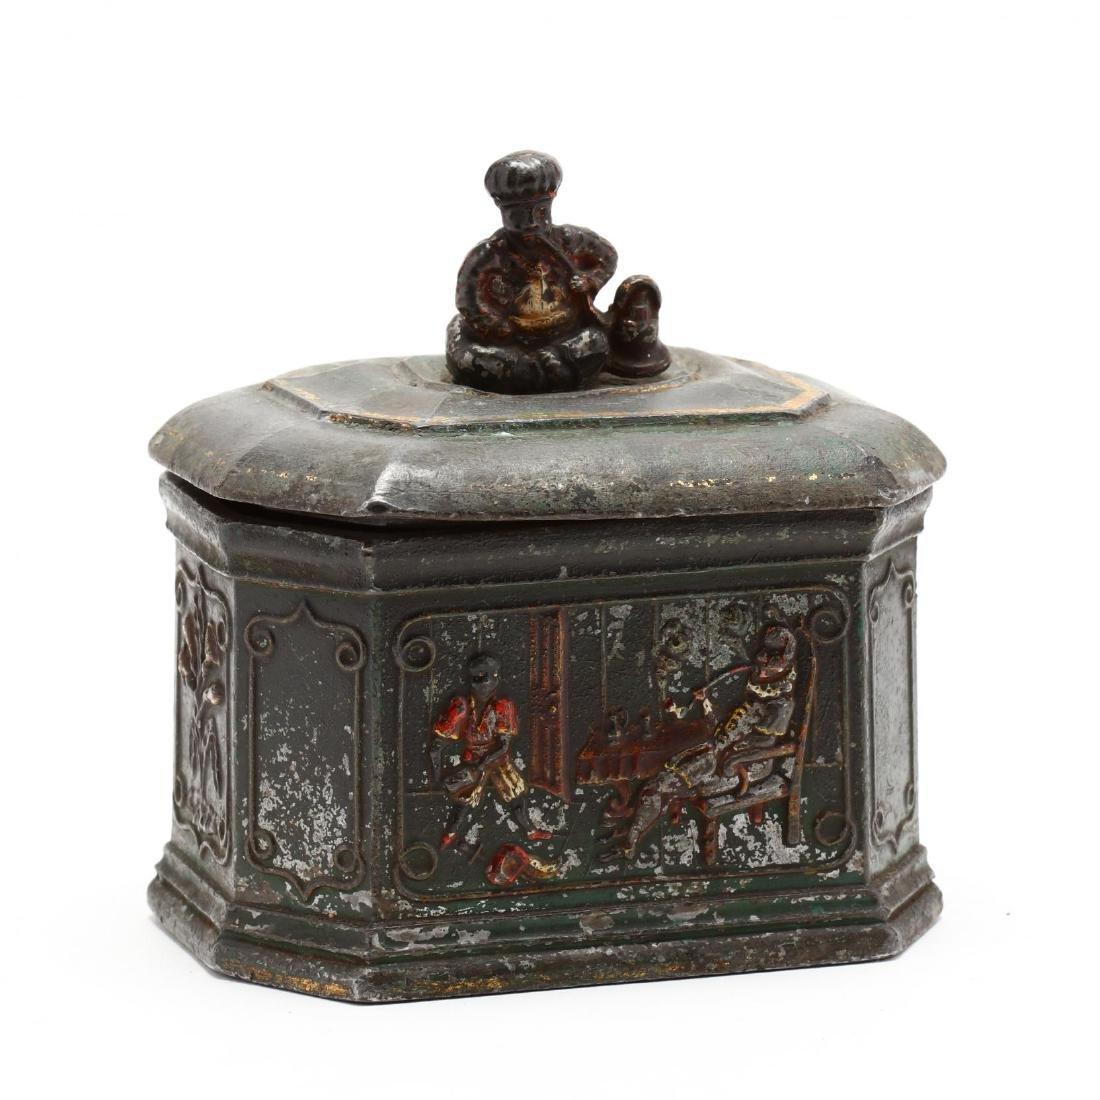 Antique English Cast Lead Humidor